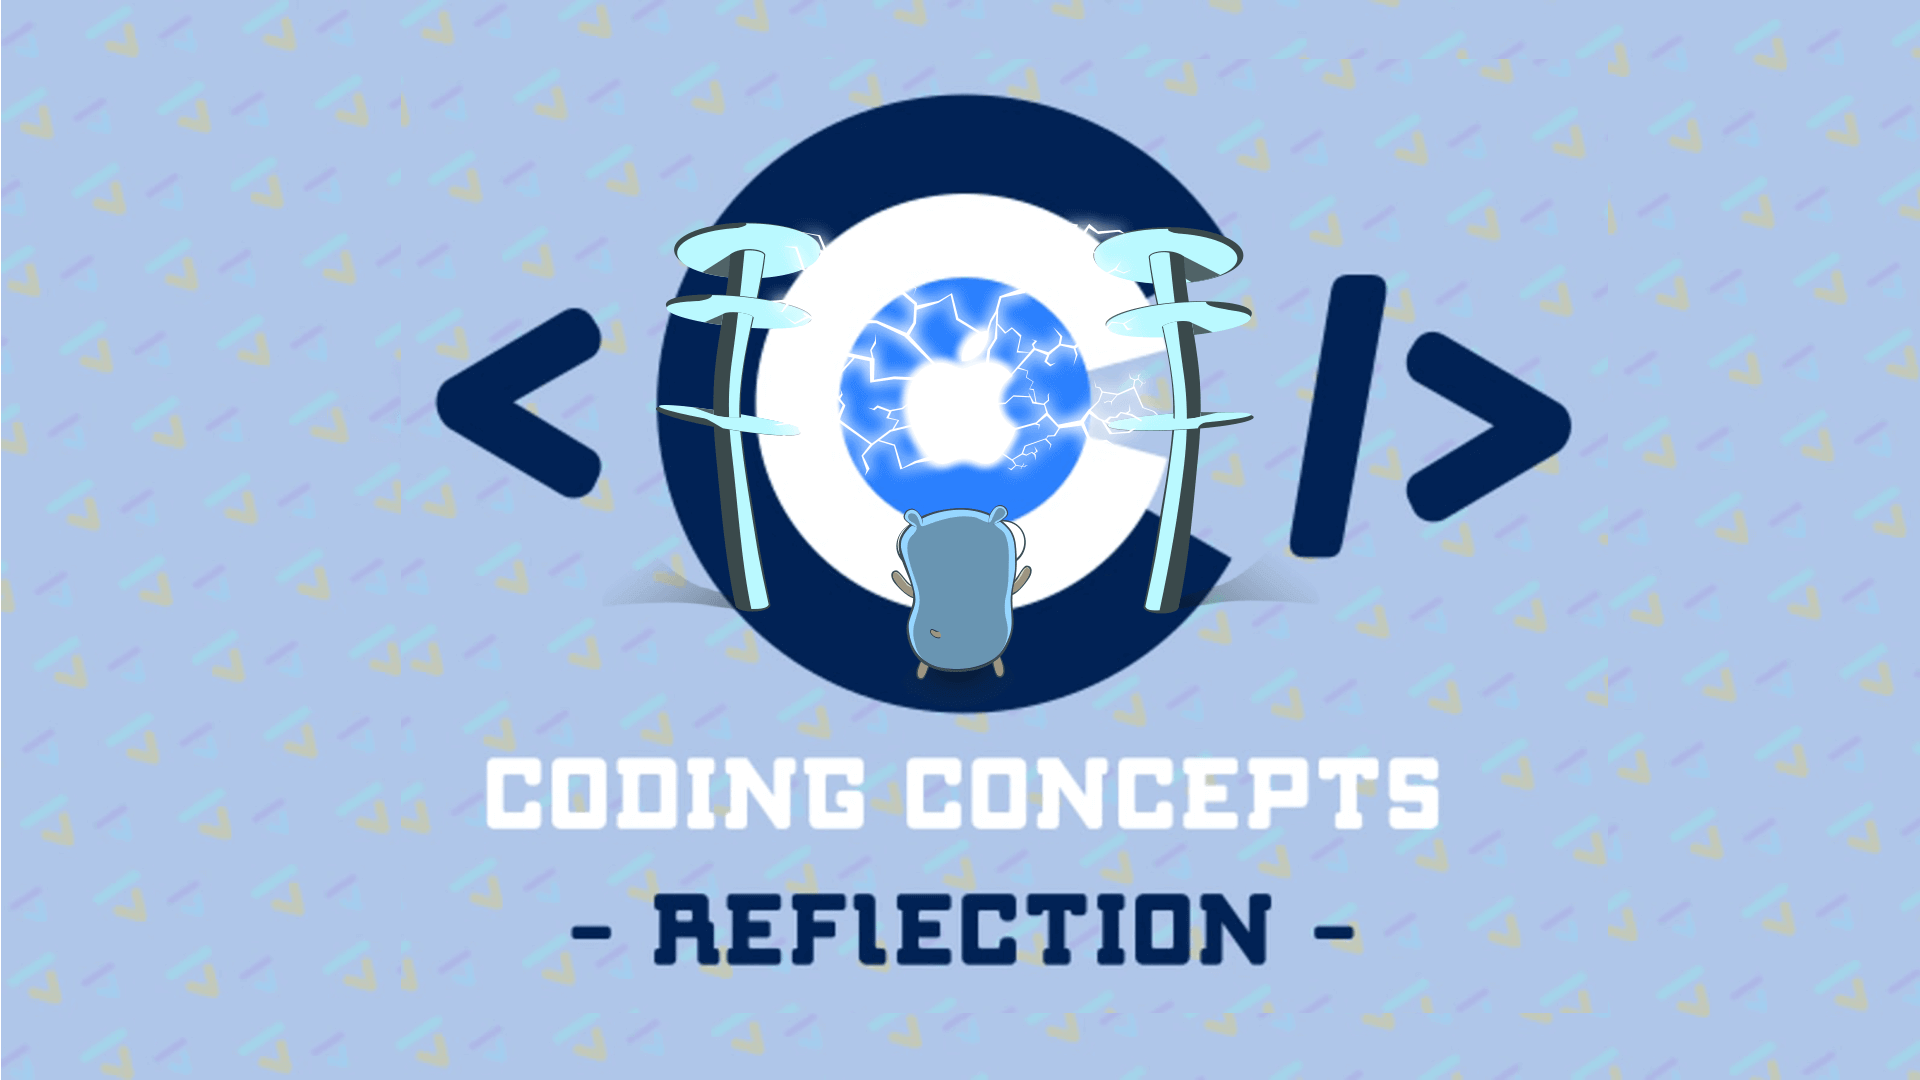 Go reflection 三定律与最佳实践